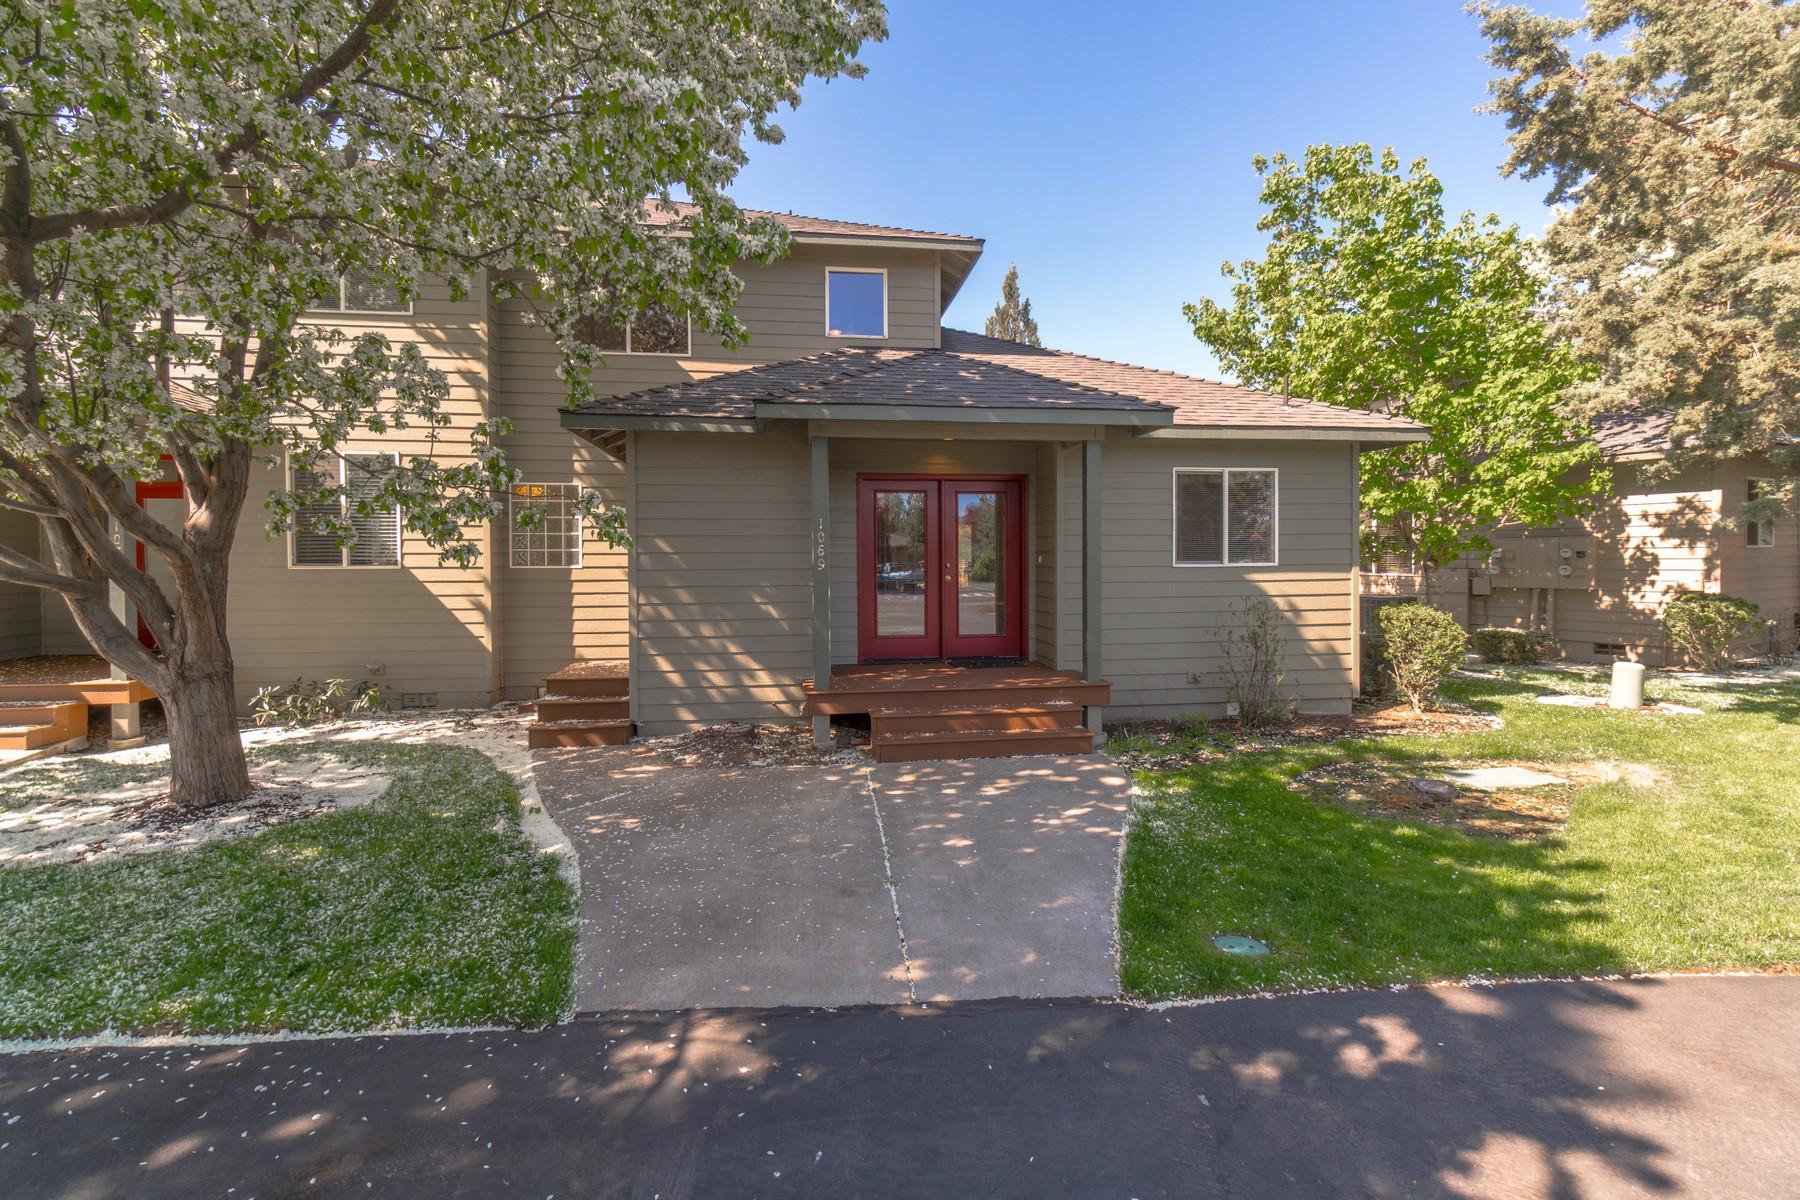 townhouses για την Πώληση στο 1069 Golden Pheasant Drive Redmond, OR 97756 Redmond, Ορεγκον 97756 Ηνωμένες Πολιτείες